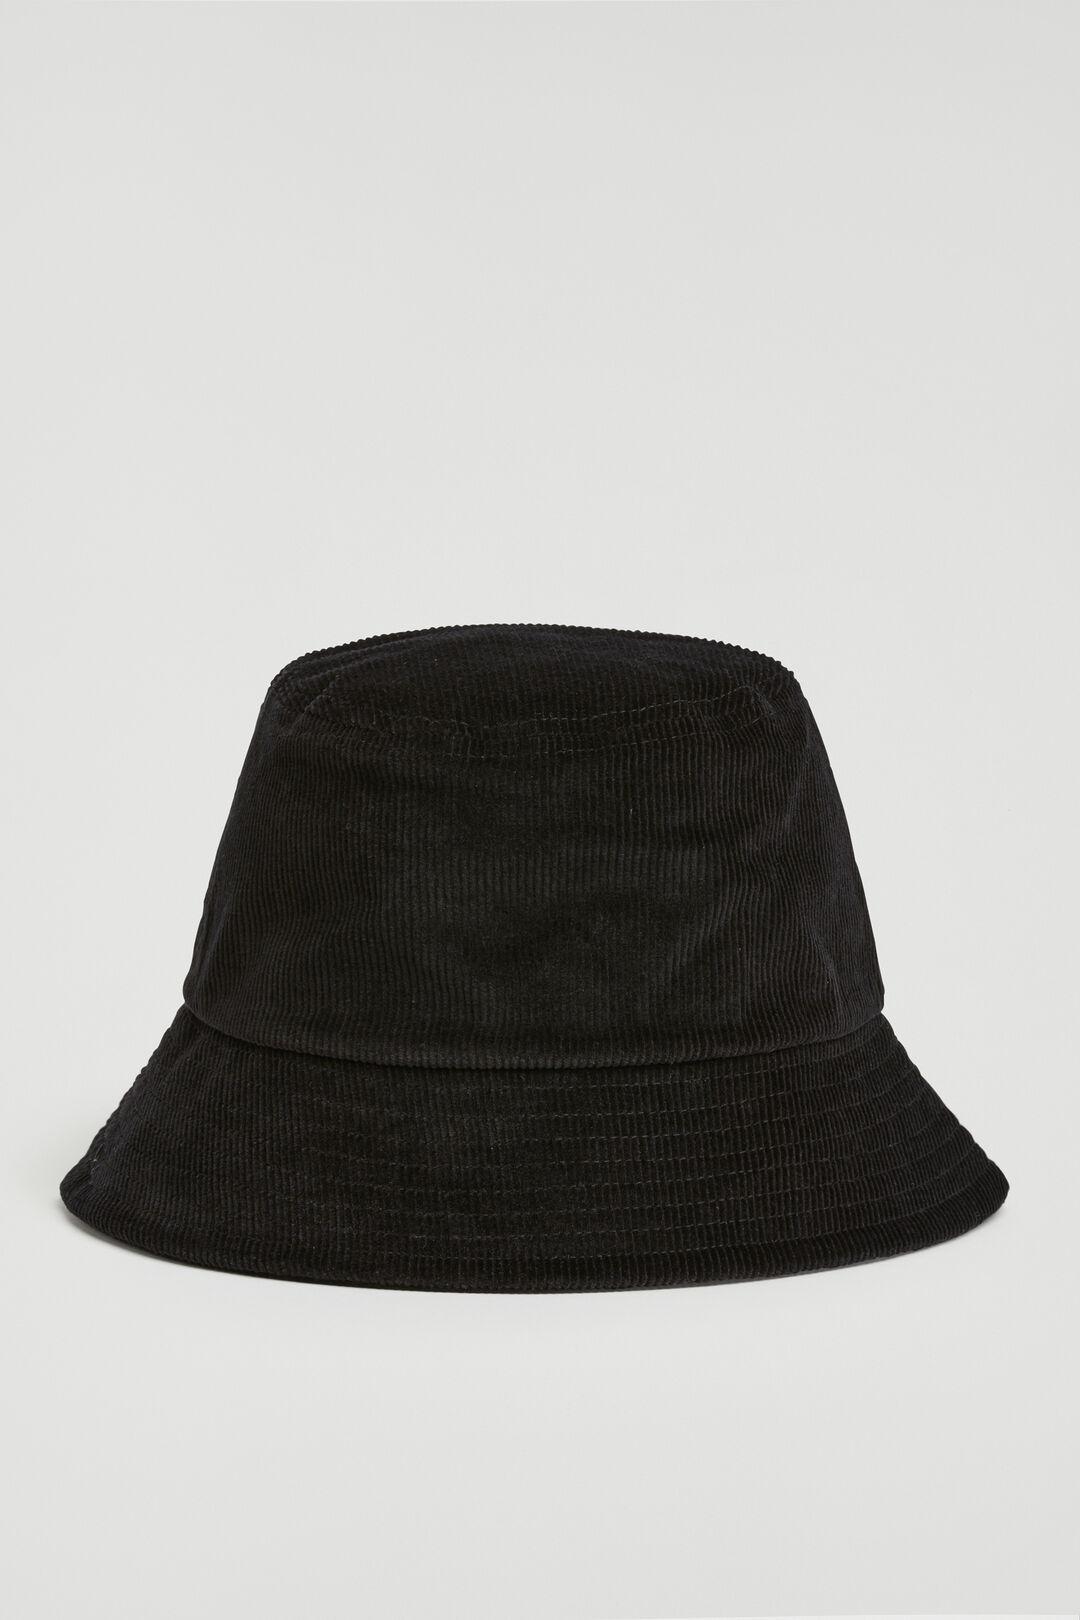 CORD BUCKET HAT  BLACK  hi-res